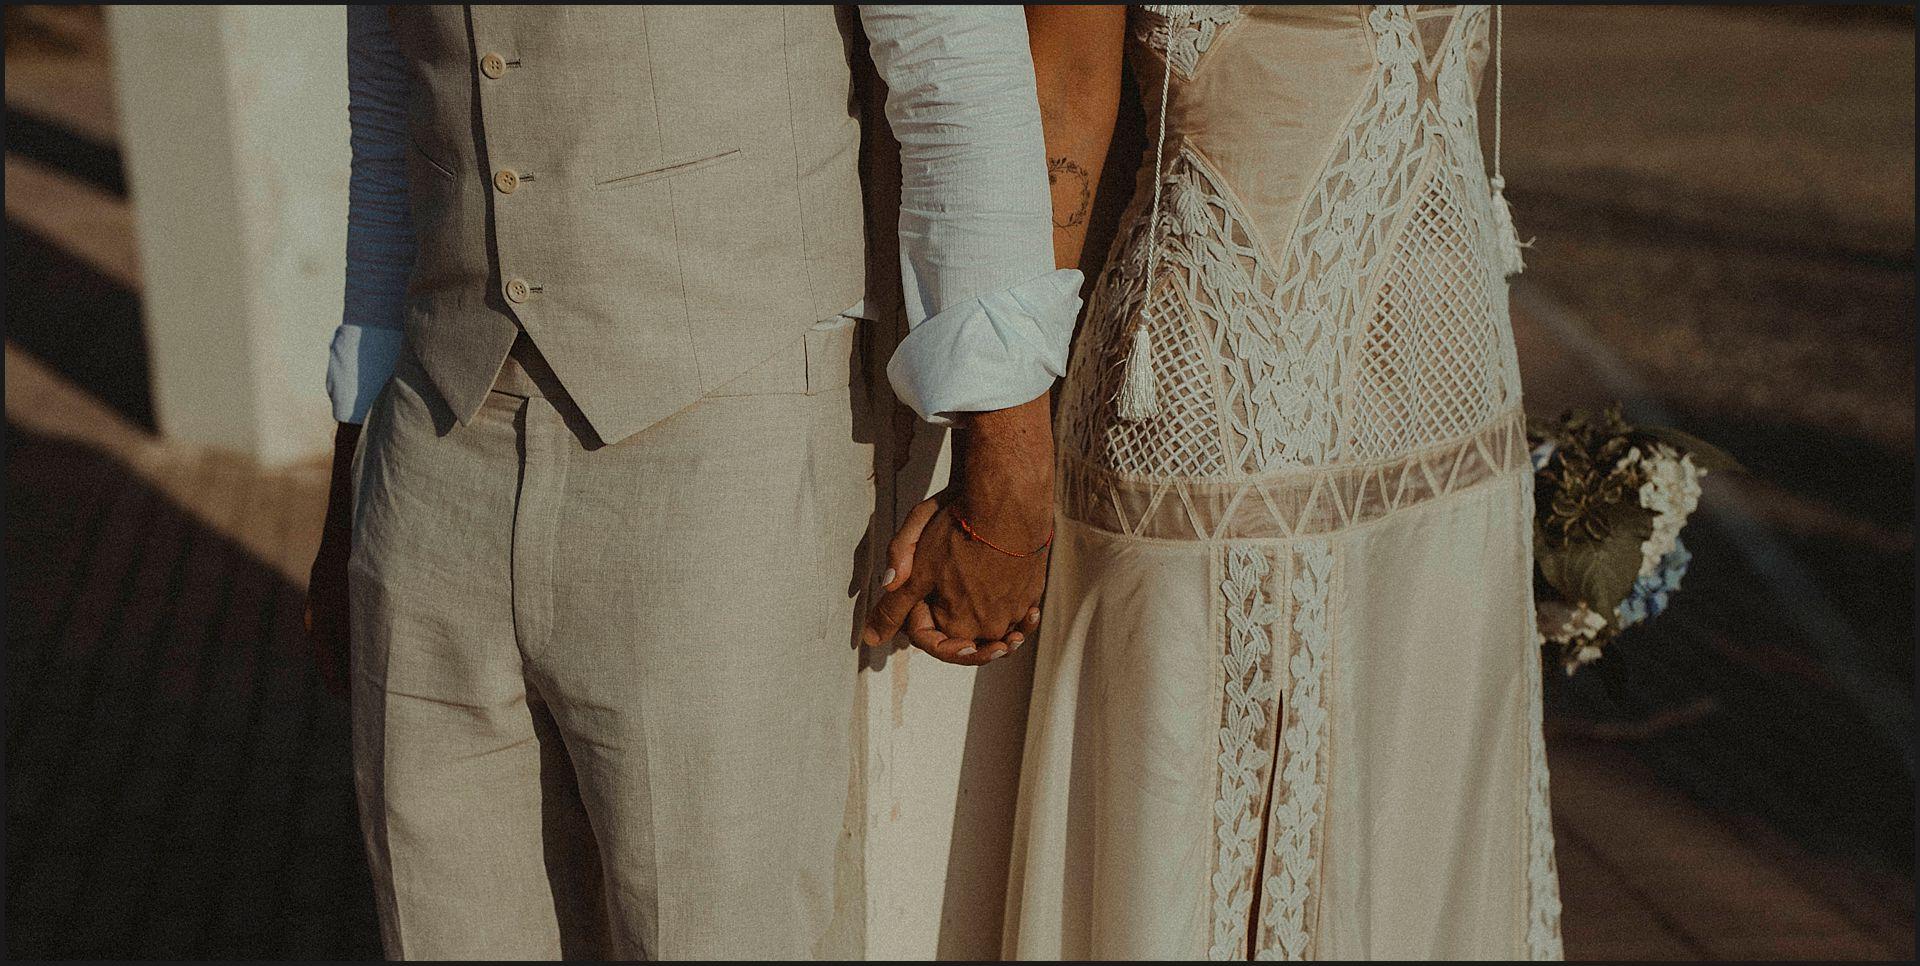 Bride and groom, hand in hand, destination wedding, civitavecchia, brazilian couple, details, dress details